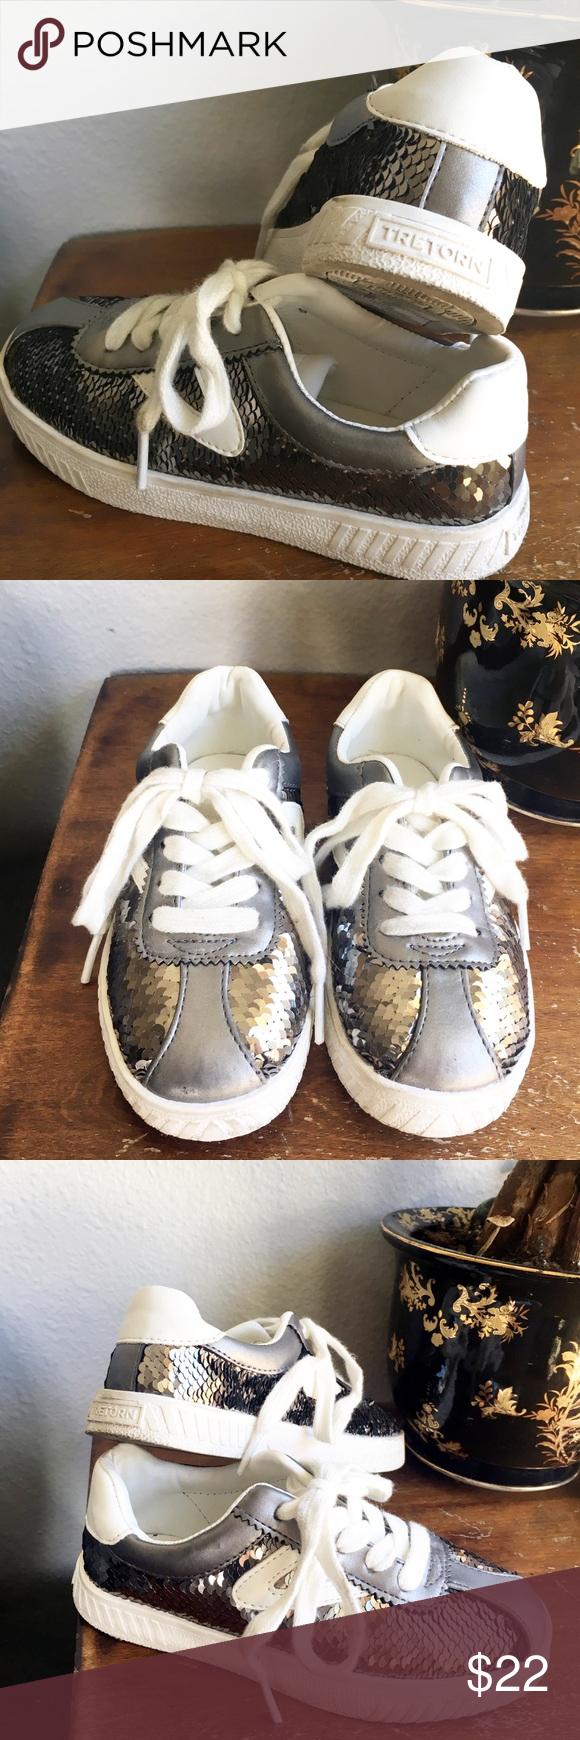 Girls silver sequin sneakers Tretorn